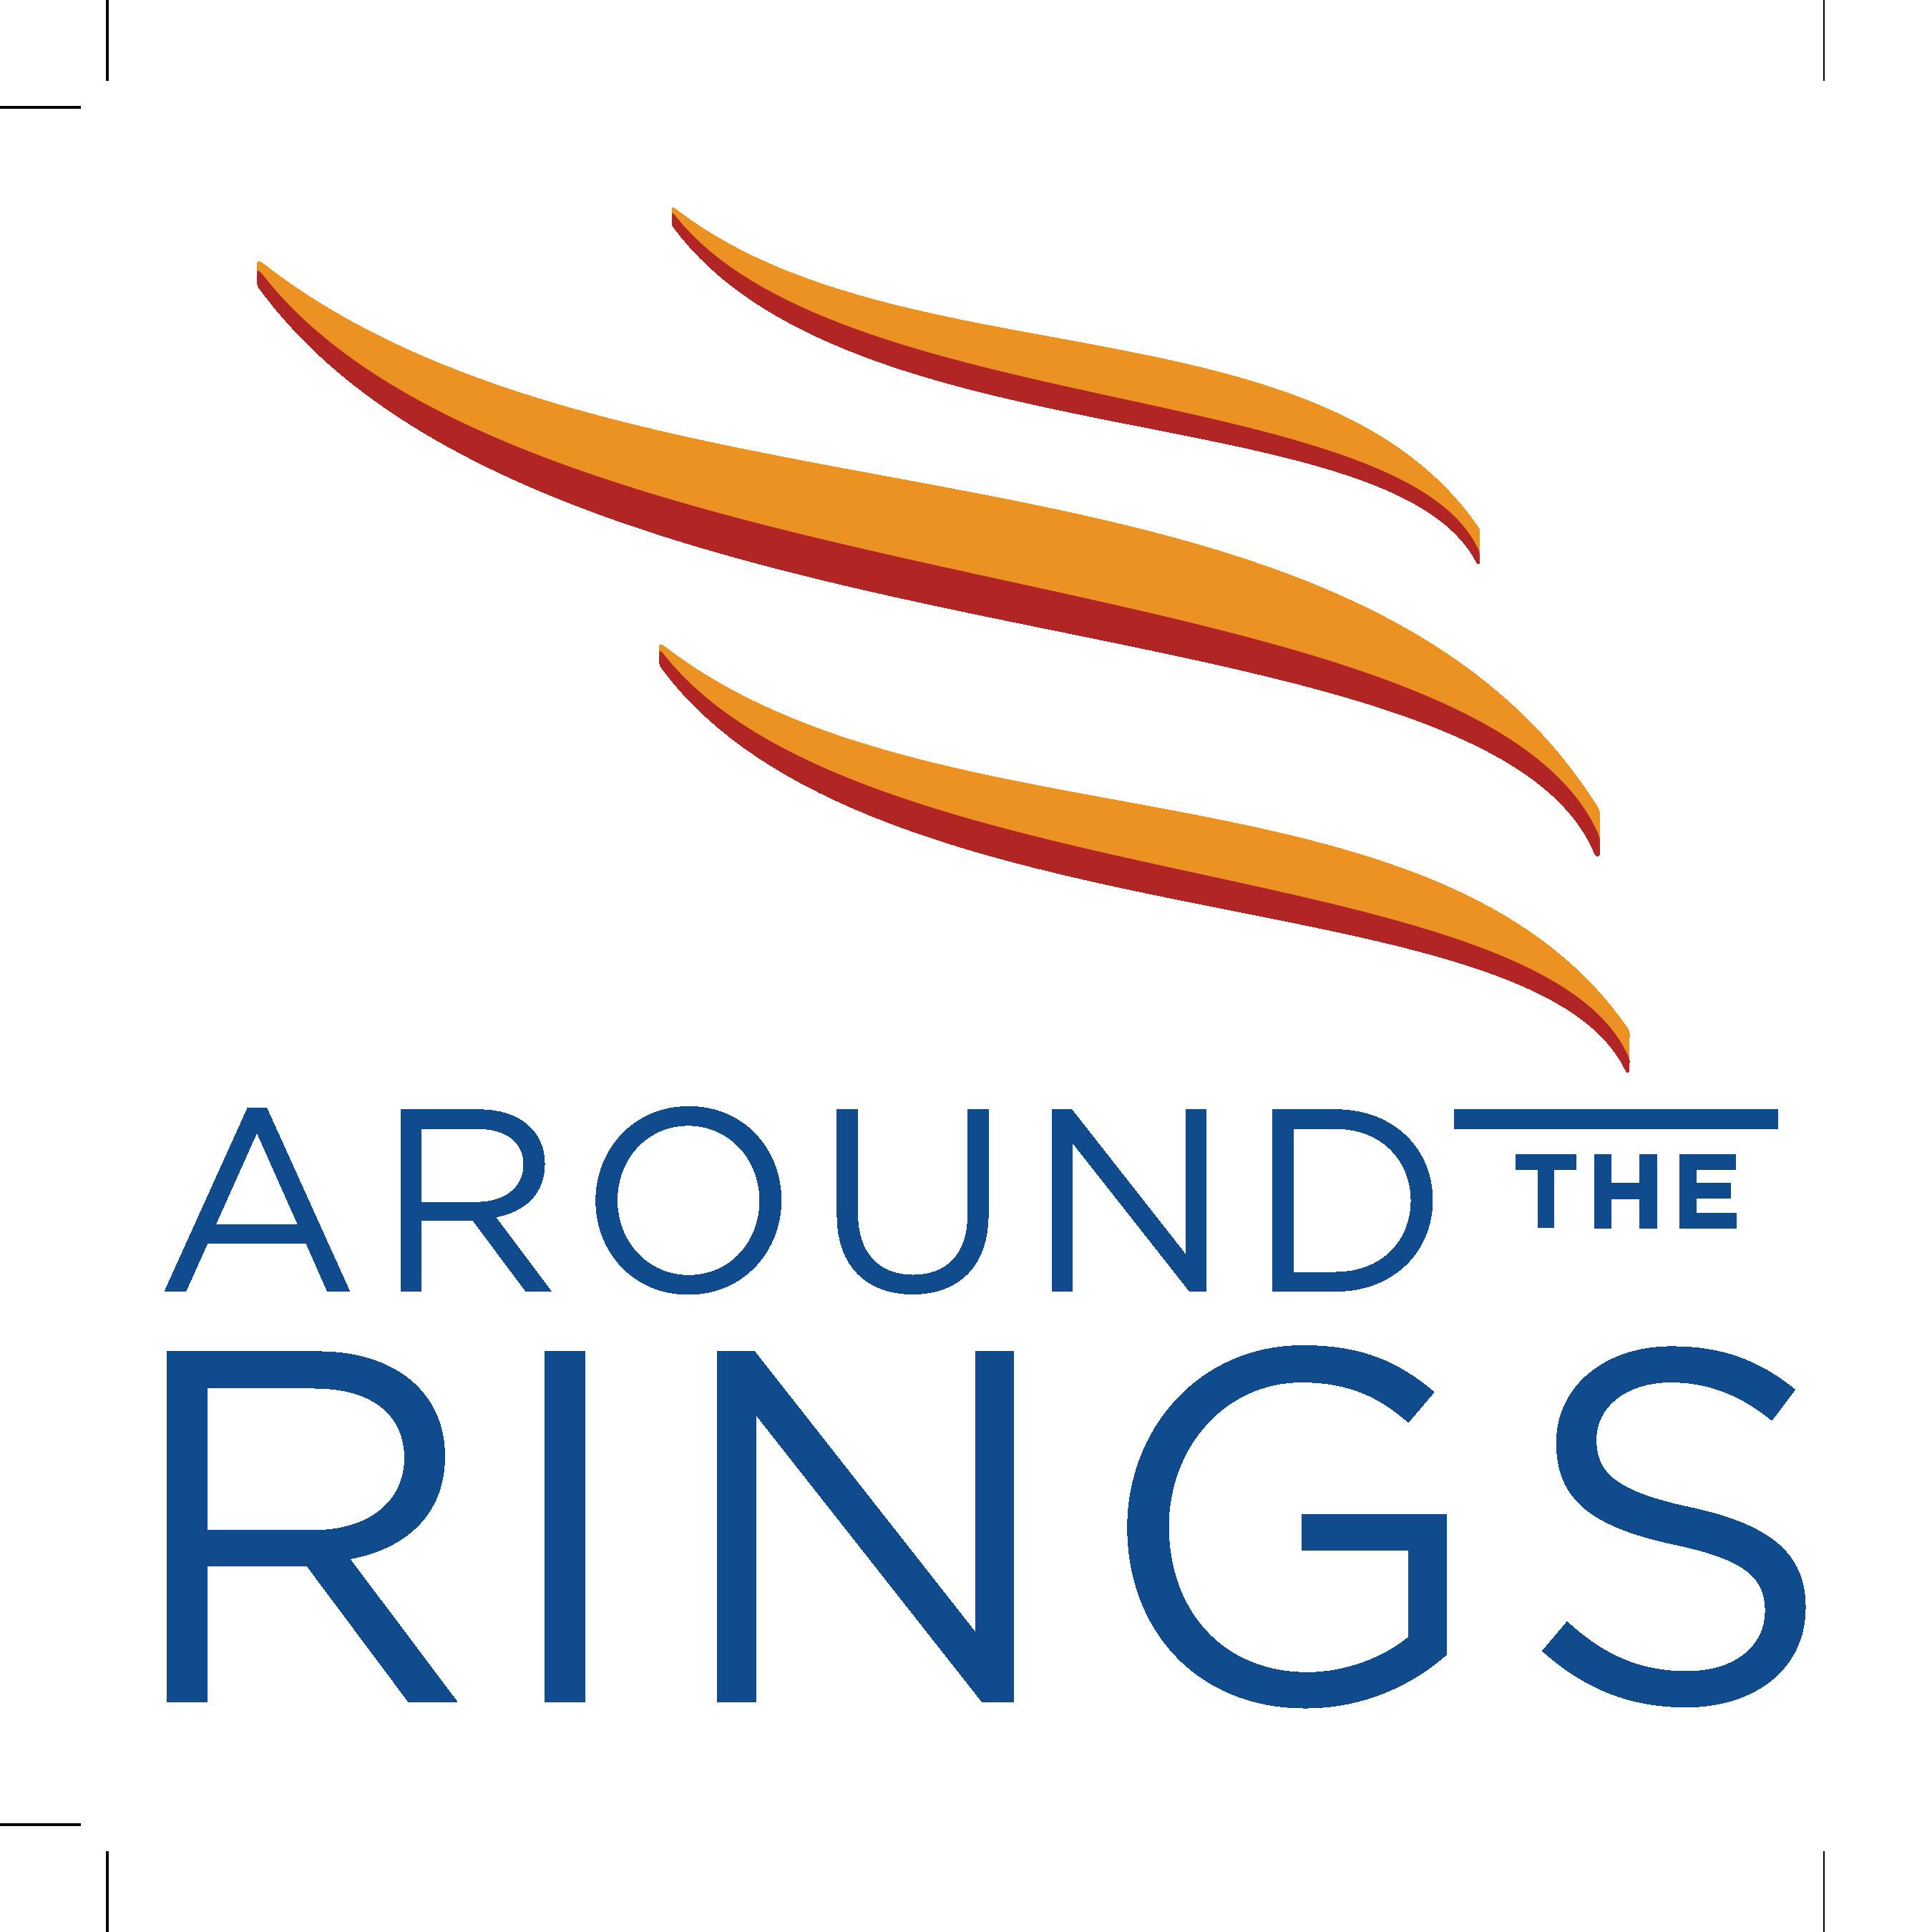 Around the Rings